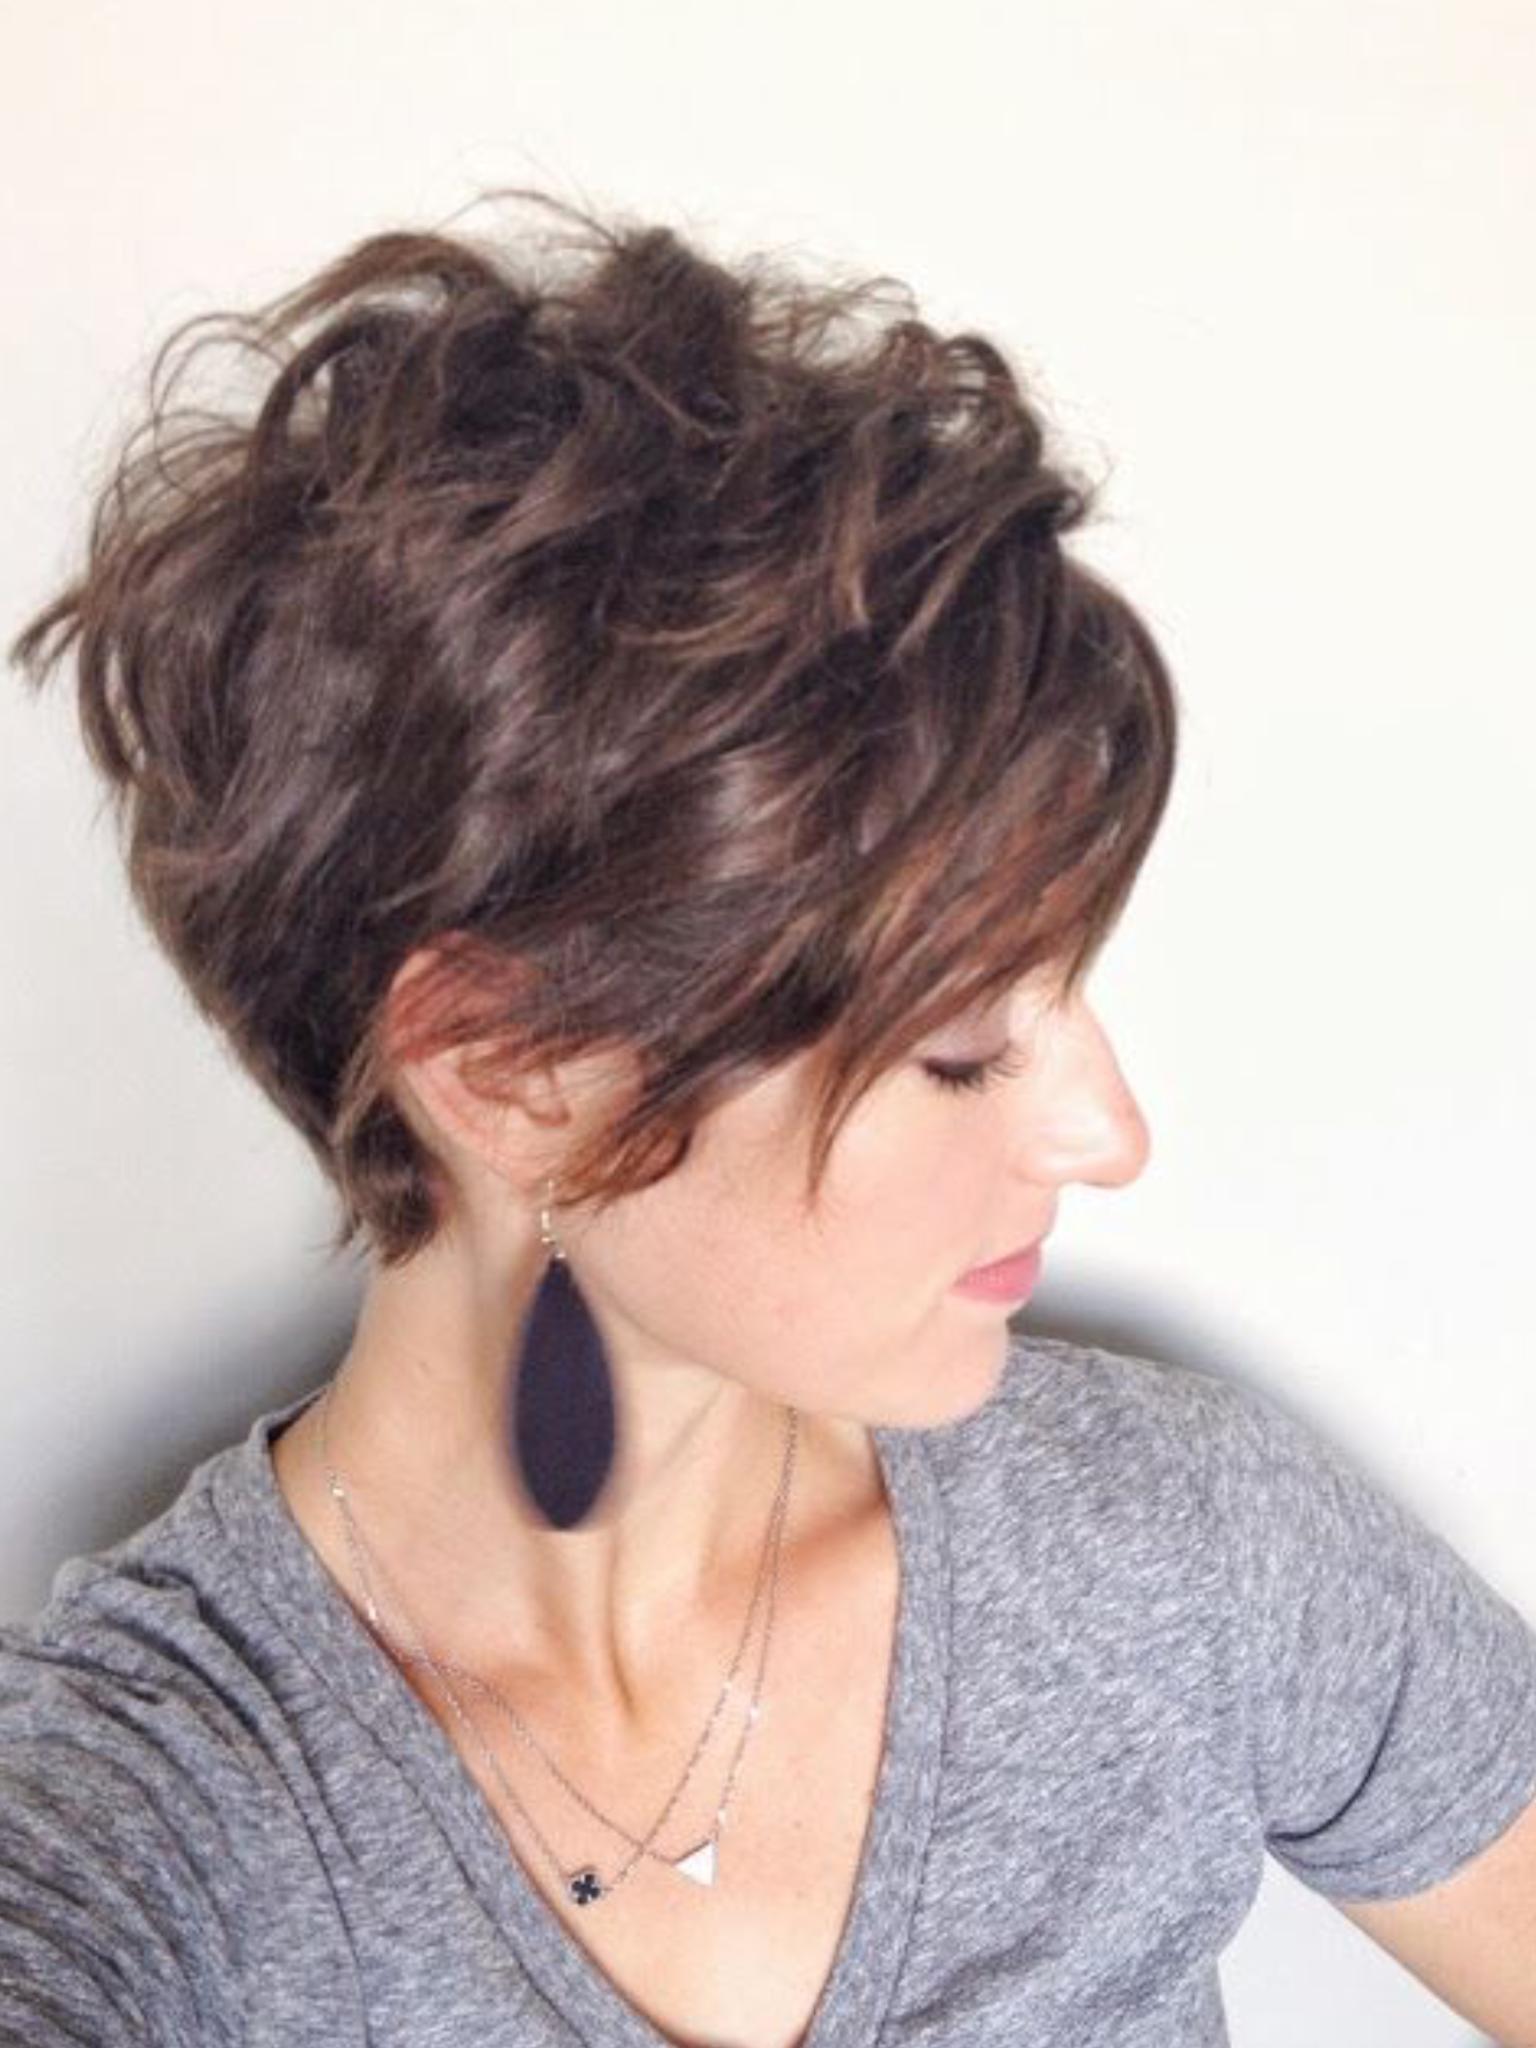 Pin On Hairstyles Ideas